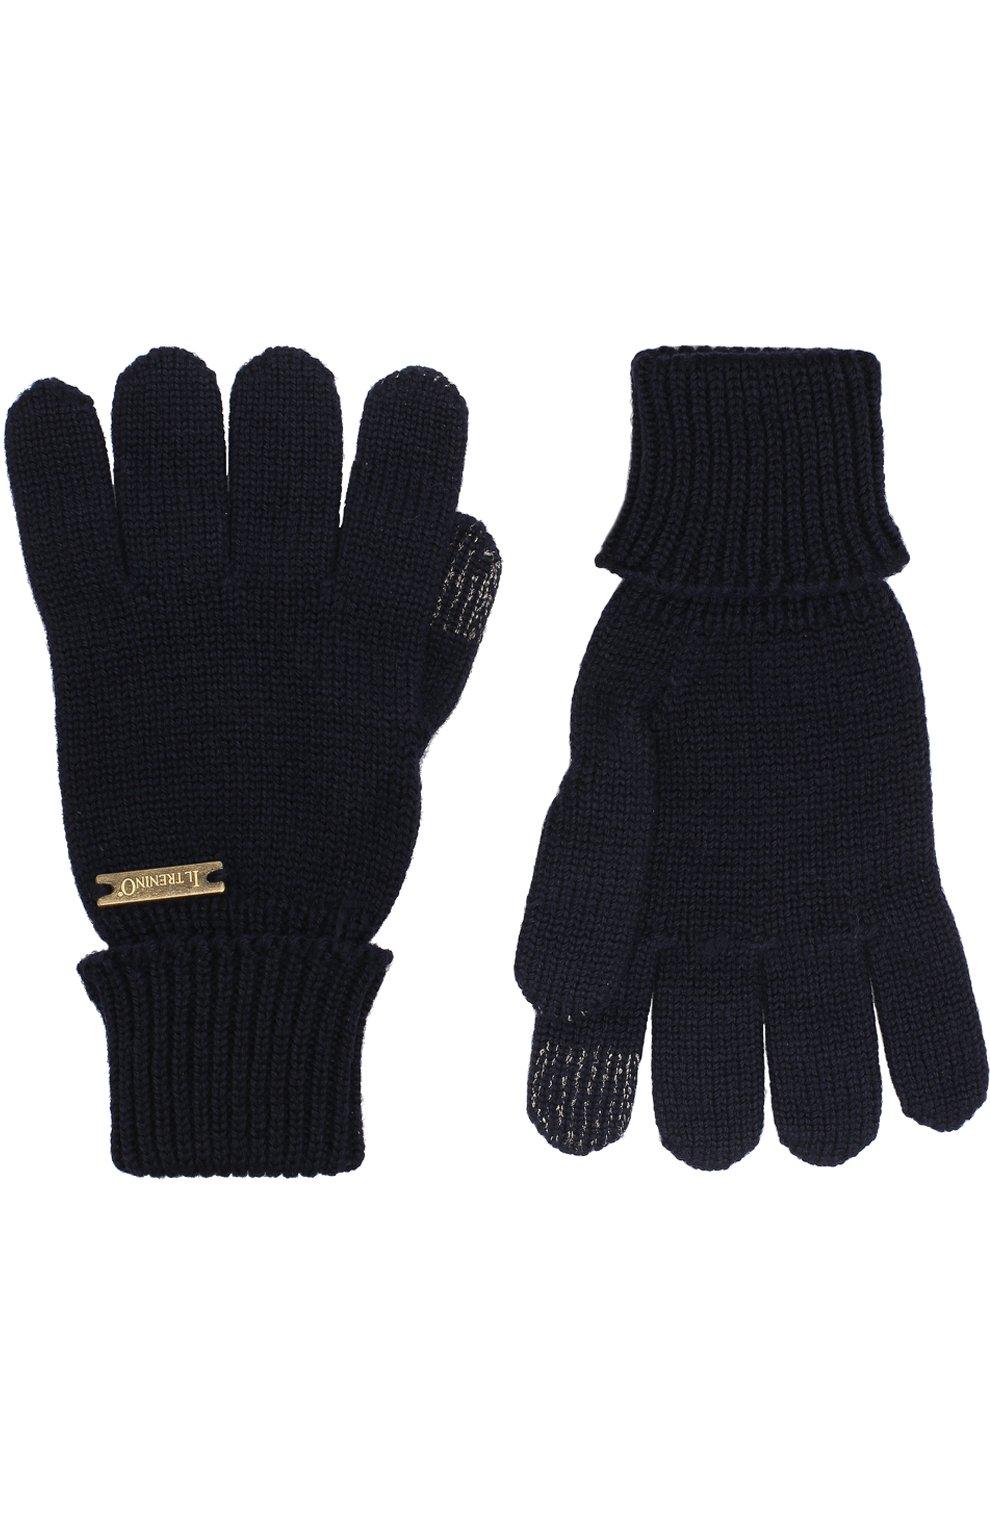 Детские перчатки из шерсти IL TRENINO темно-синего цвета, арт. 18 9004/E0   Фото 2